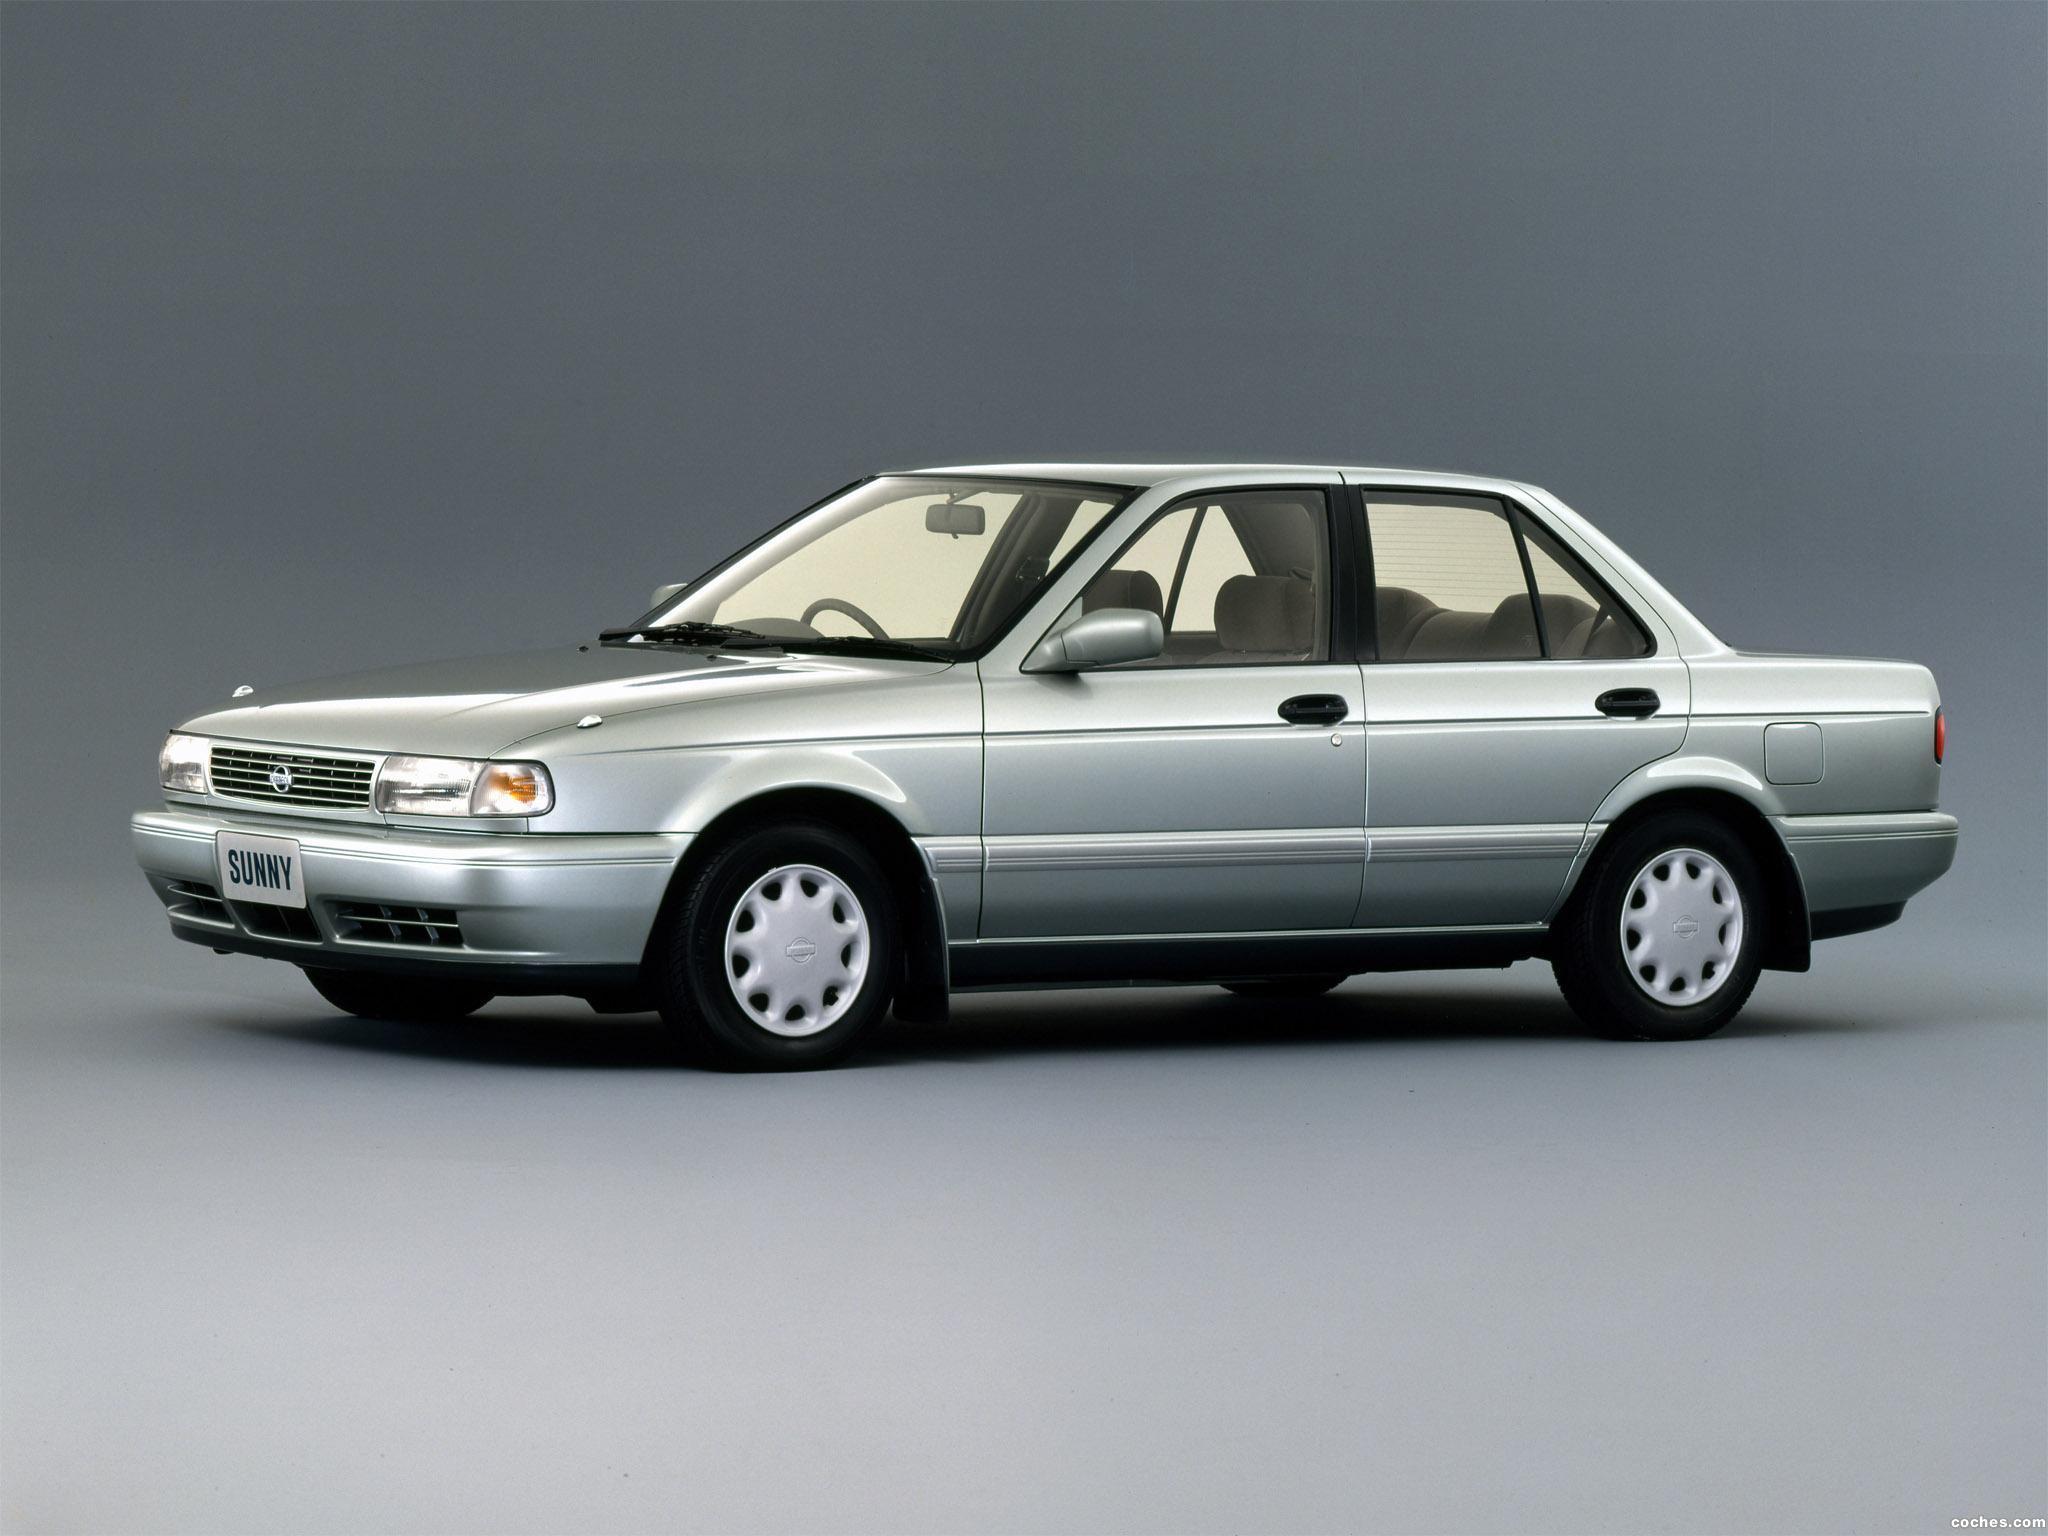 Foto 0 de Nissan Sunny SuperSaloon B13 1992